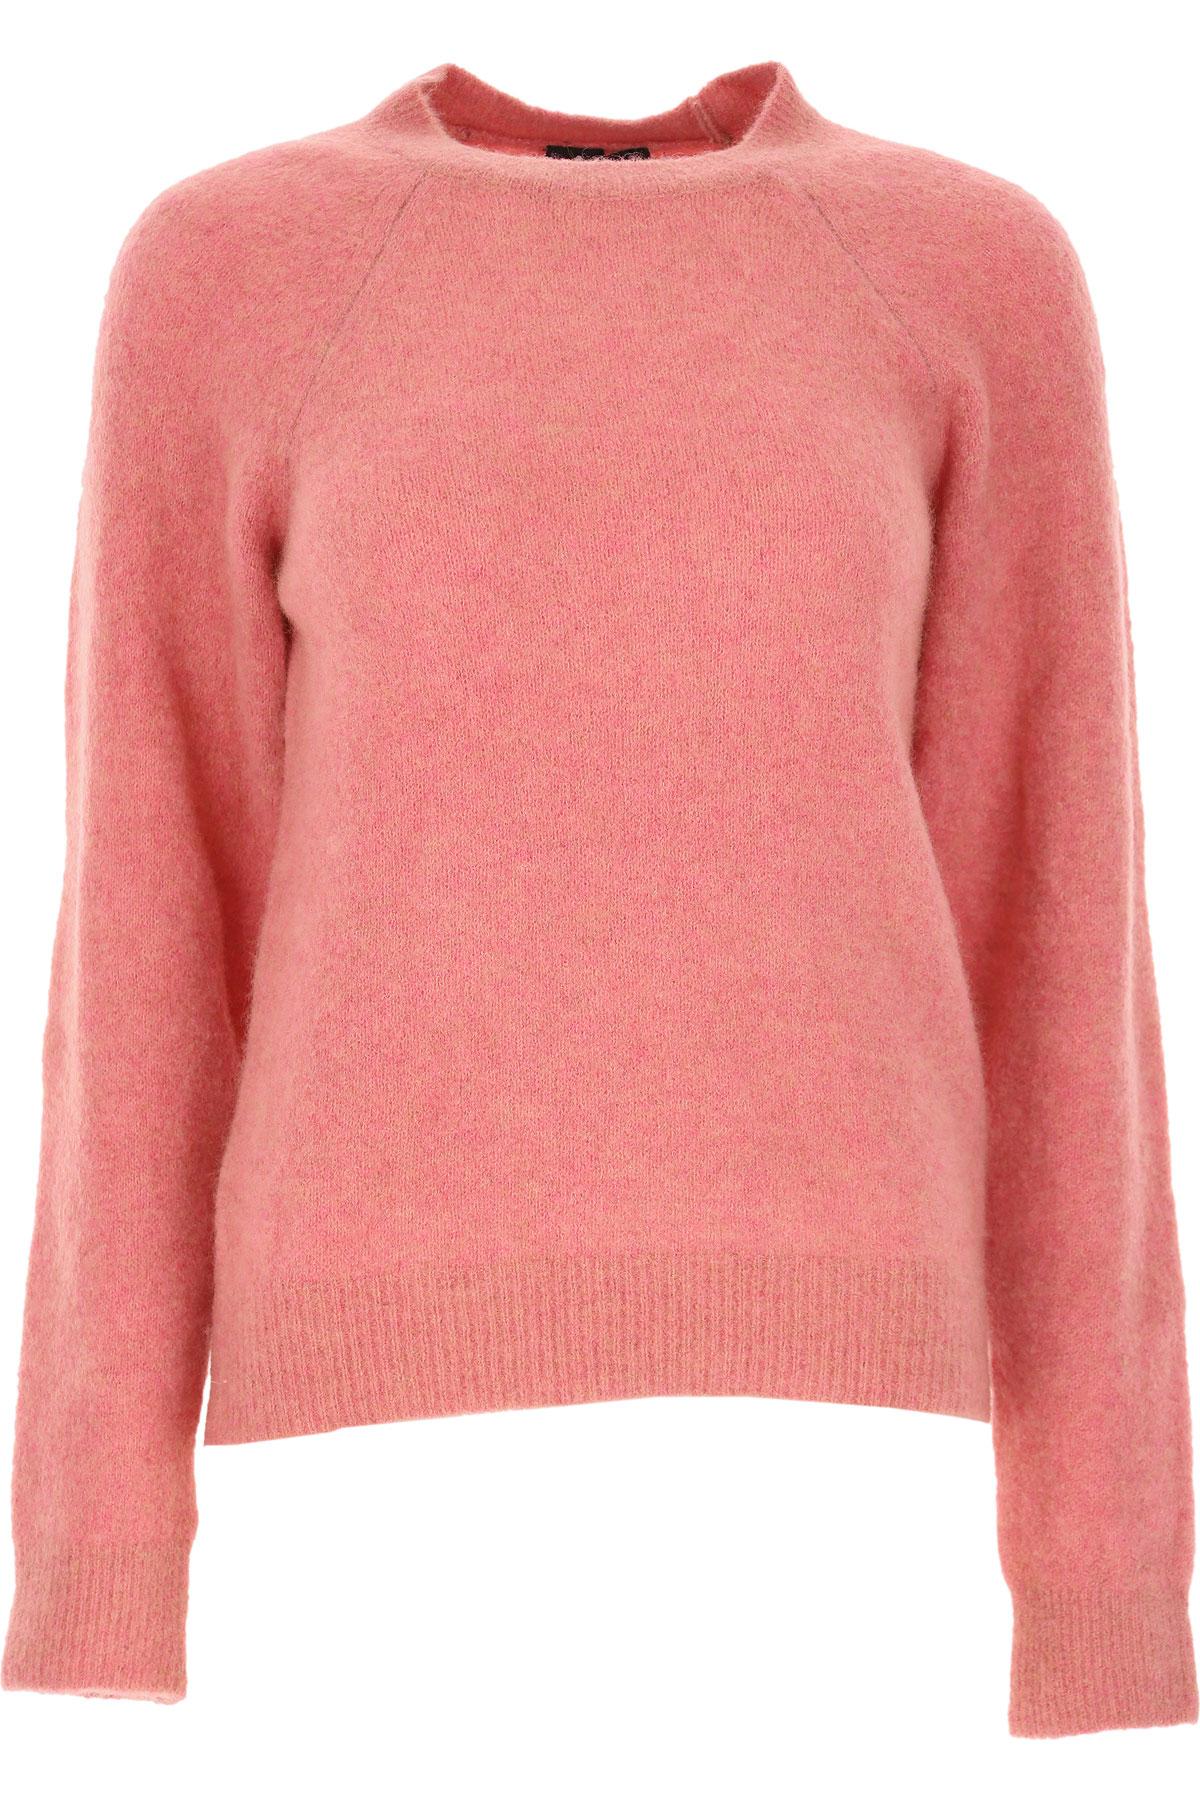 A.P.C Sweater for Women Jumper On Sale, Phard, Wool, 2019, 4 6